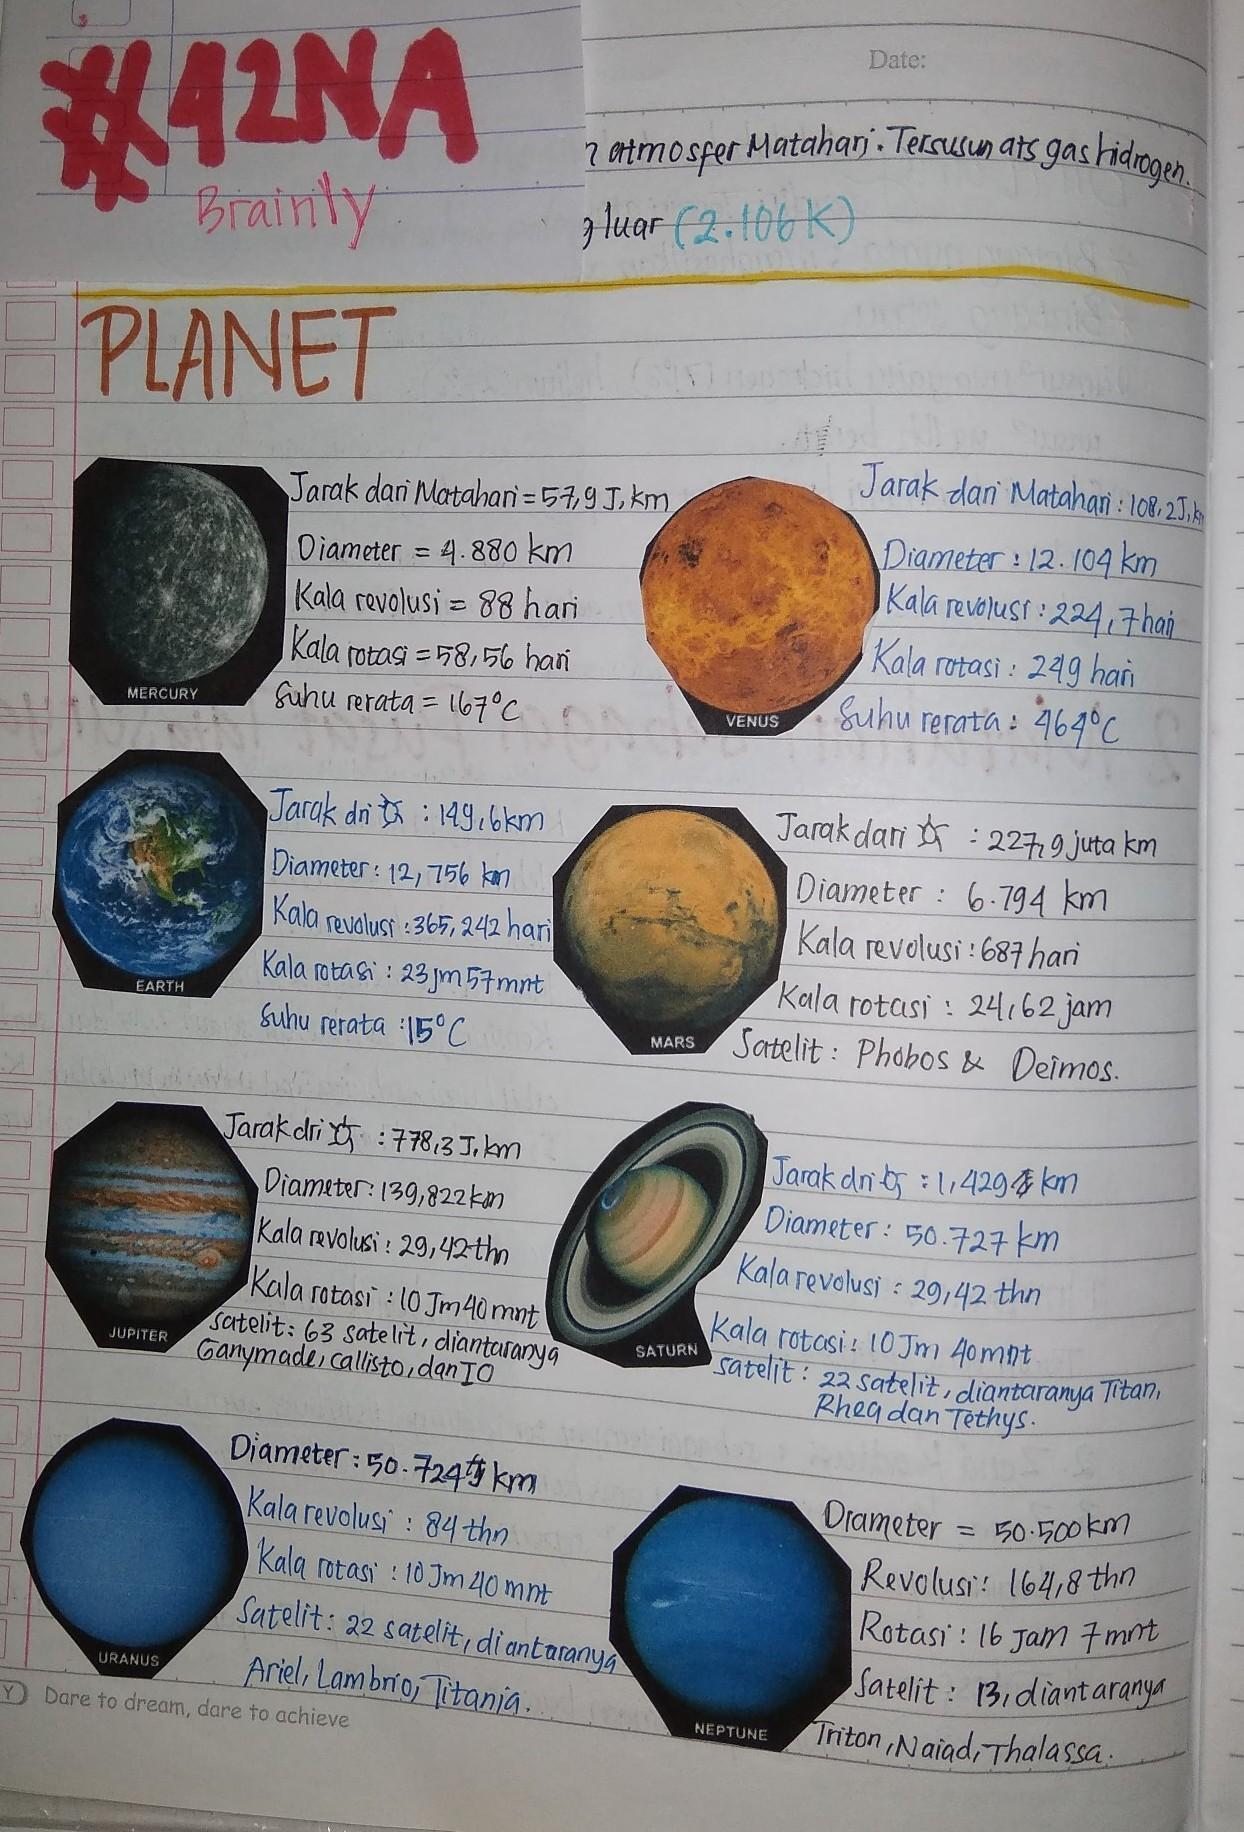 Jarak Dari Matahari Dalam Juta Kilometer : jarak, matahari, dalam, kilometer, Planet,jarak, Planet, Matahari(juta, Km),dan, Perbandingan, Jarak, Antar, Dalam, Brainly.co.id